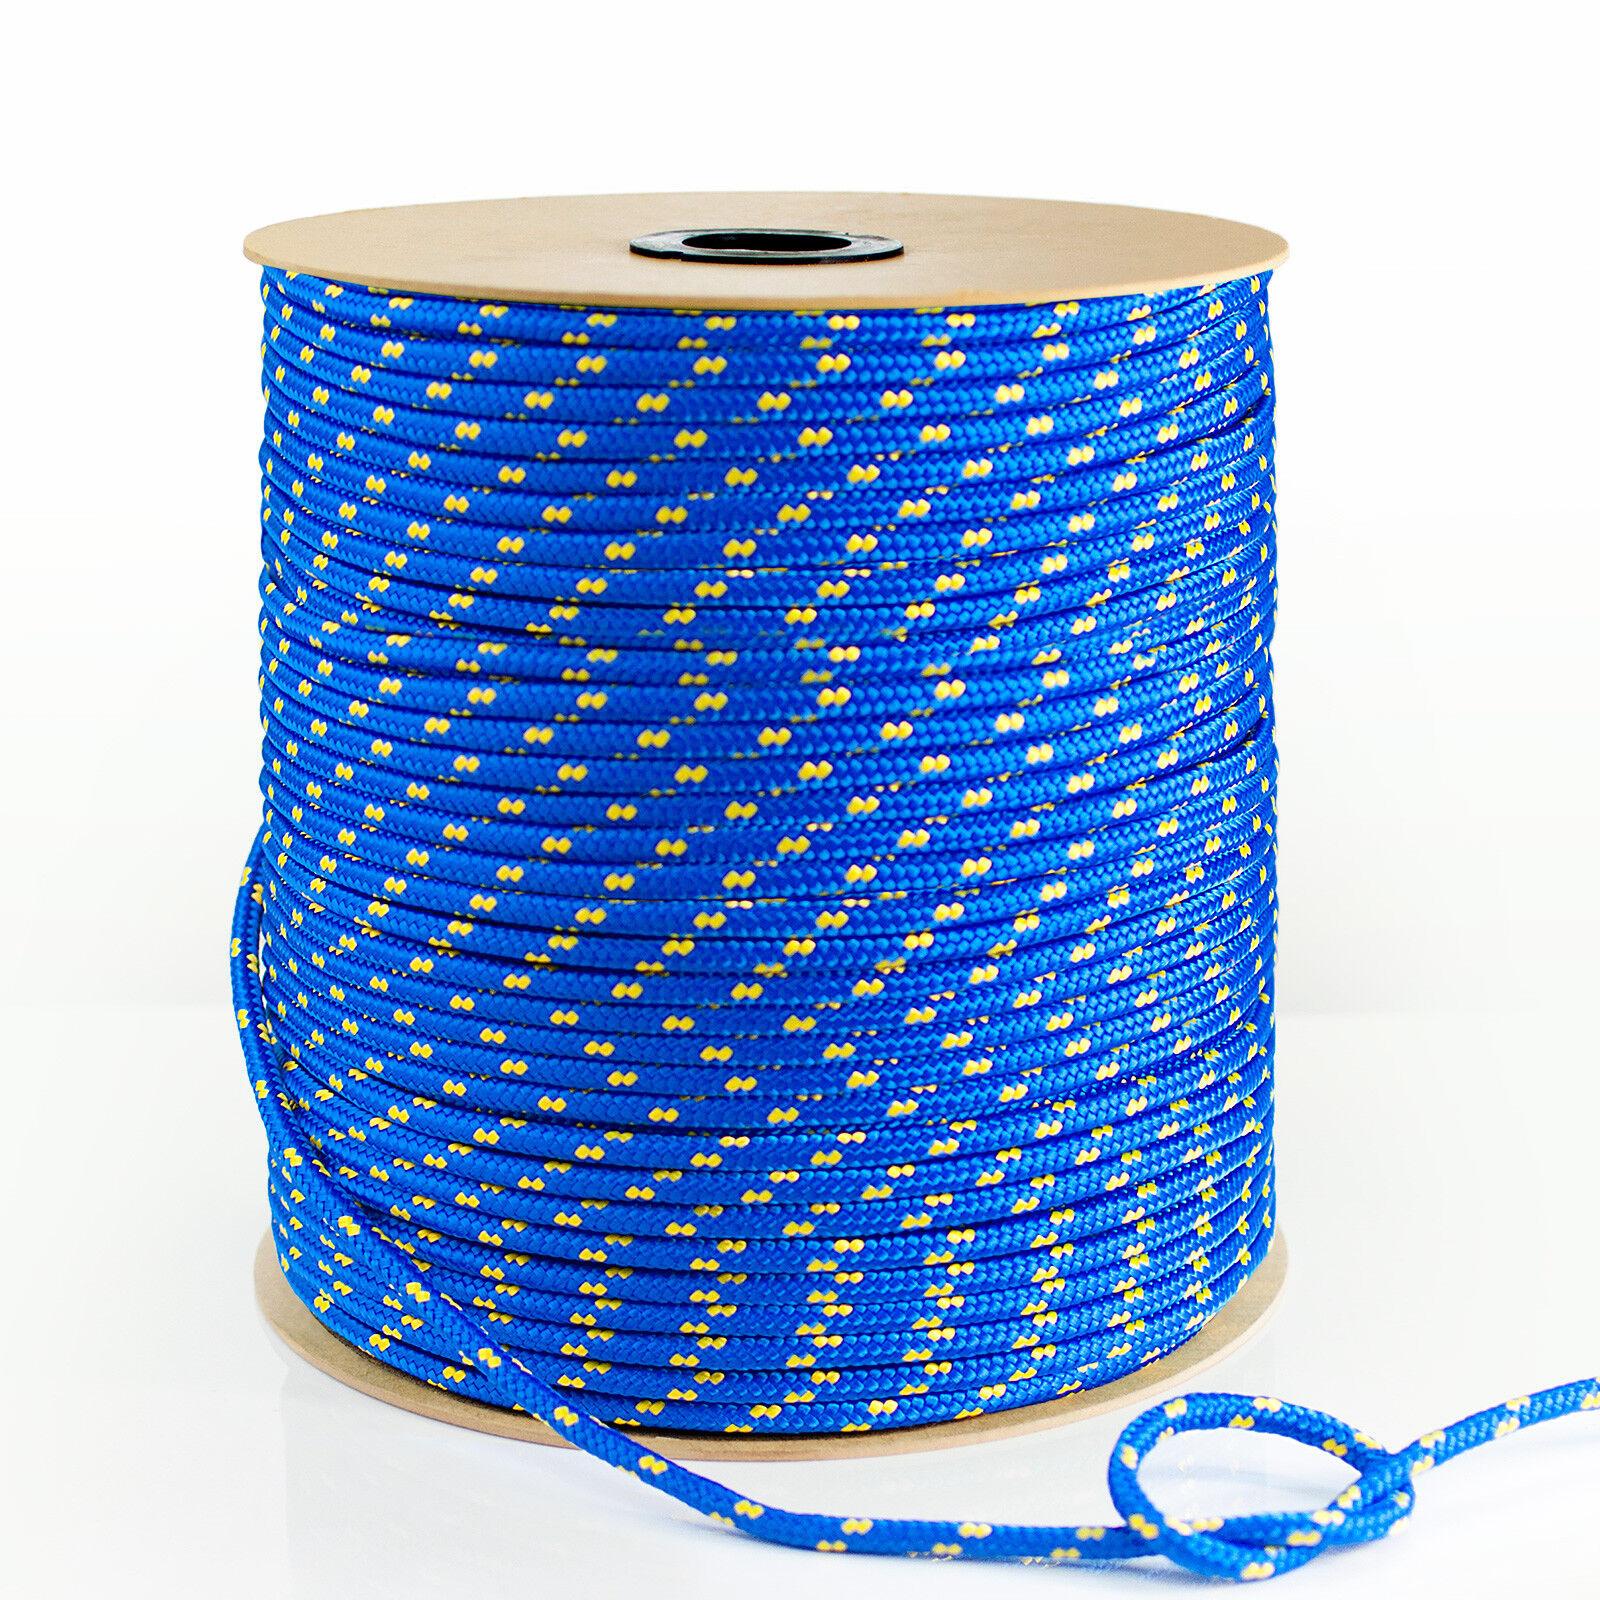 Polypropylen Seil BLAU BLAU BLAU ab 1m Flechtleine Tauwerk Polypropylenseil PP Seile 646569